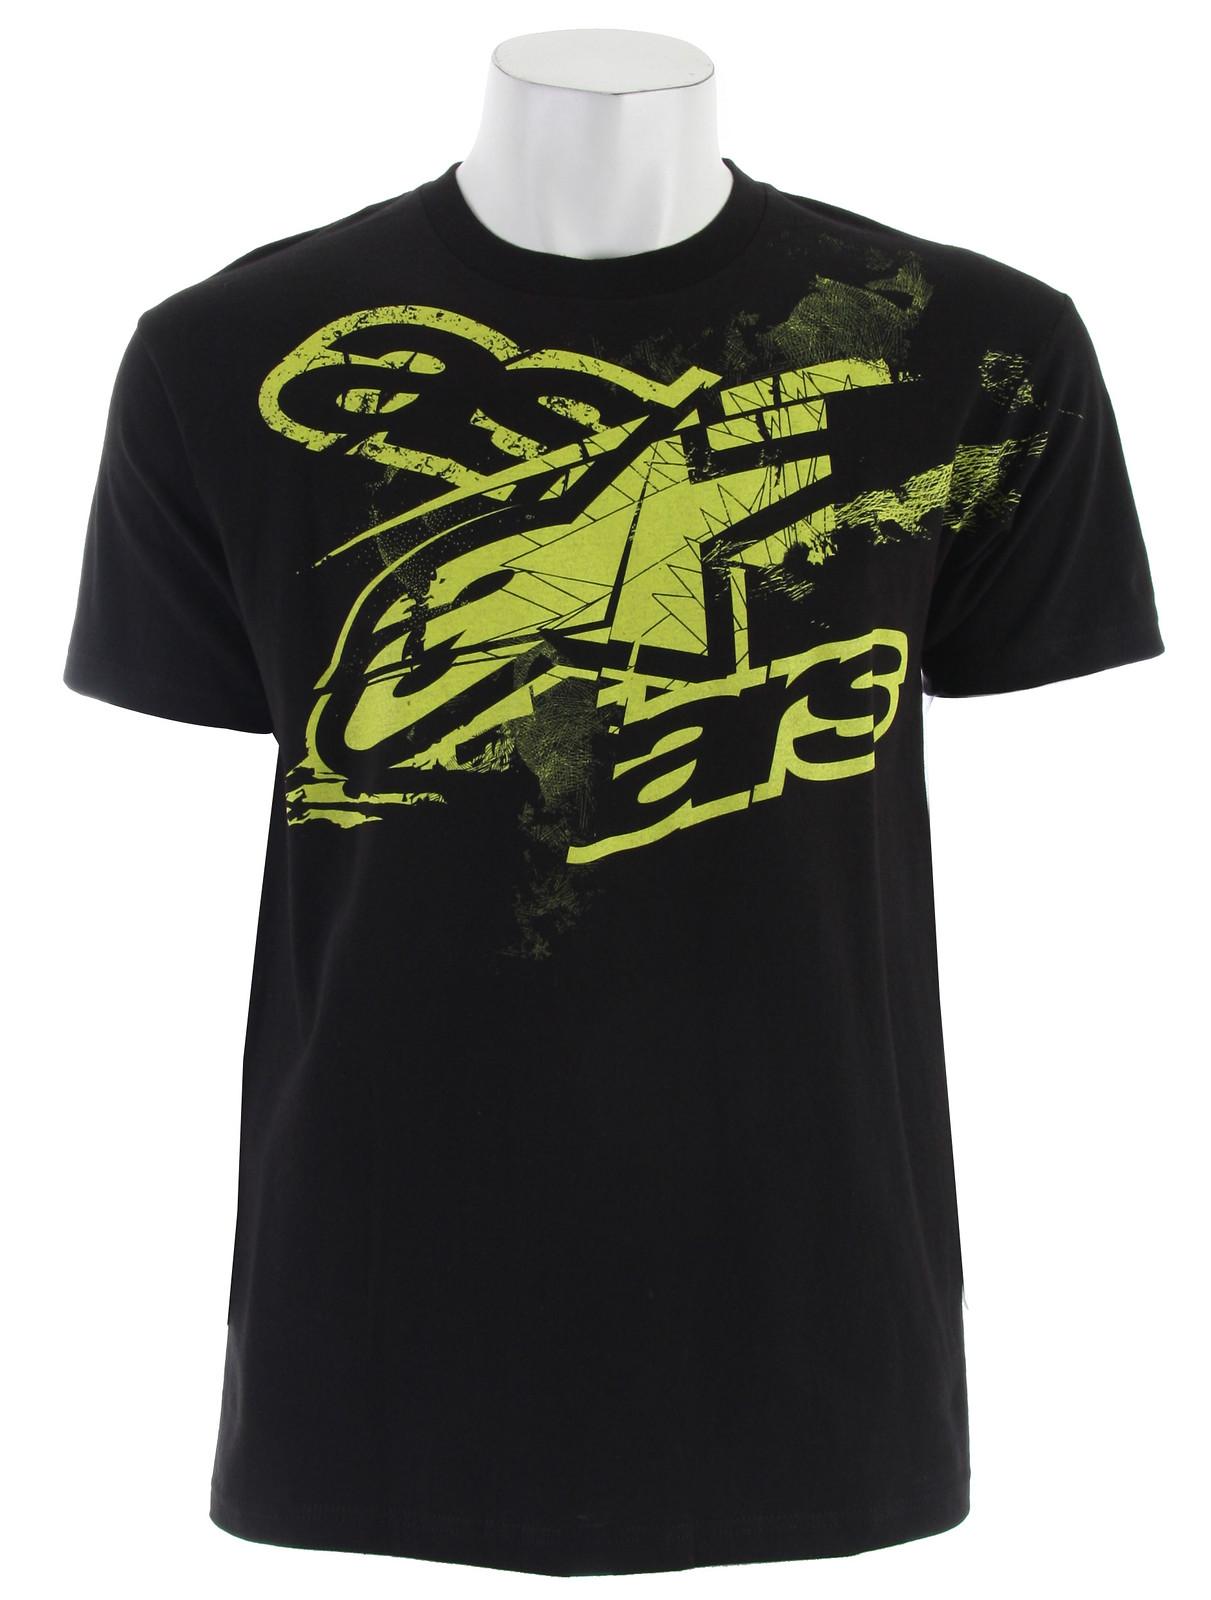 Alpinestars Vick T-Shirt Black  alpinestar-vick-t-blk-11.jpg